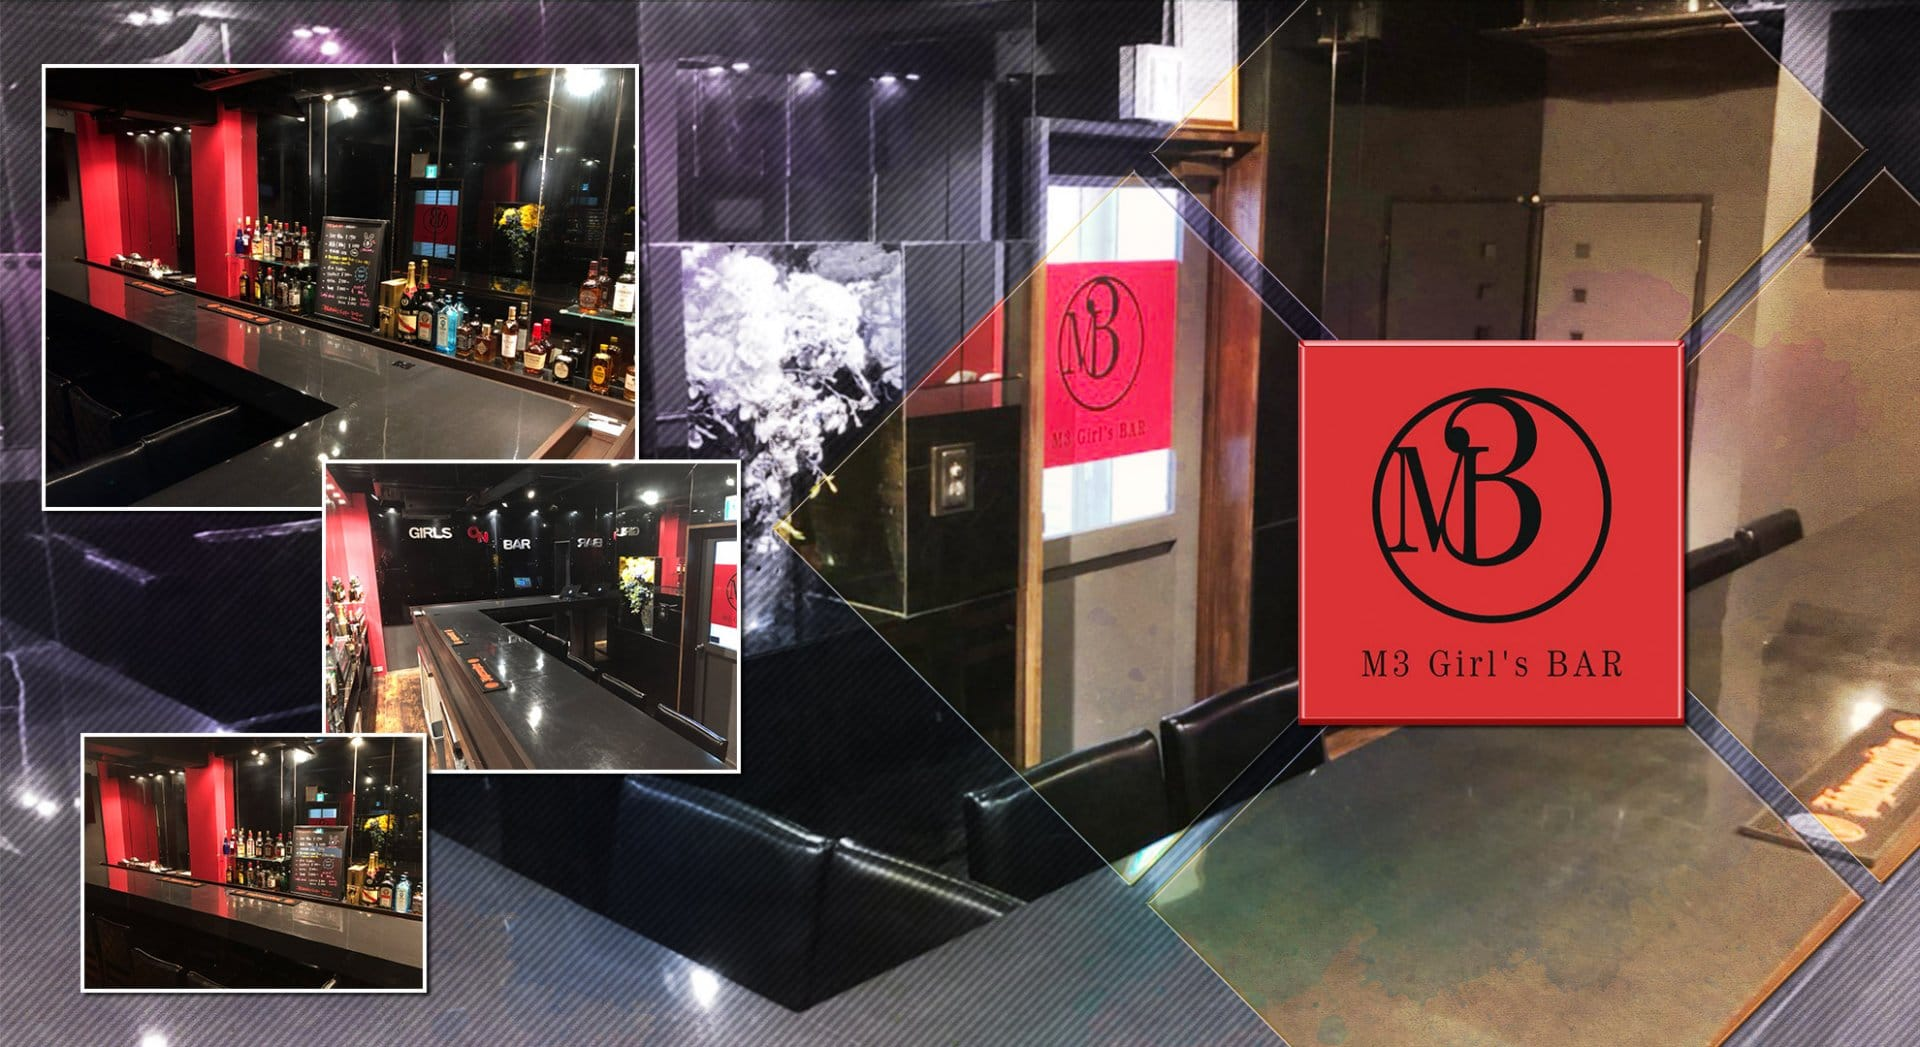 M3(エムスリー) 五反田ガールズバー TOP画像